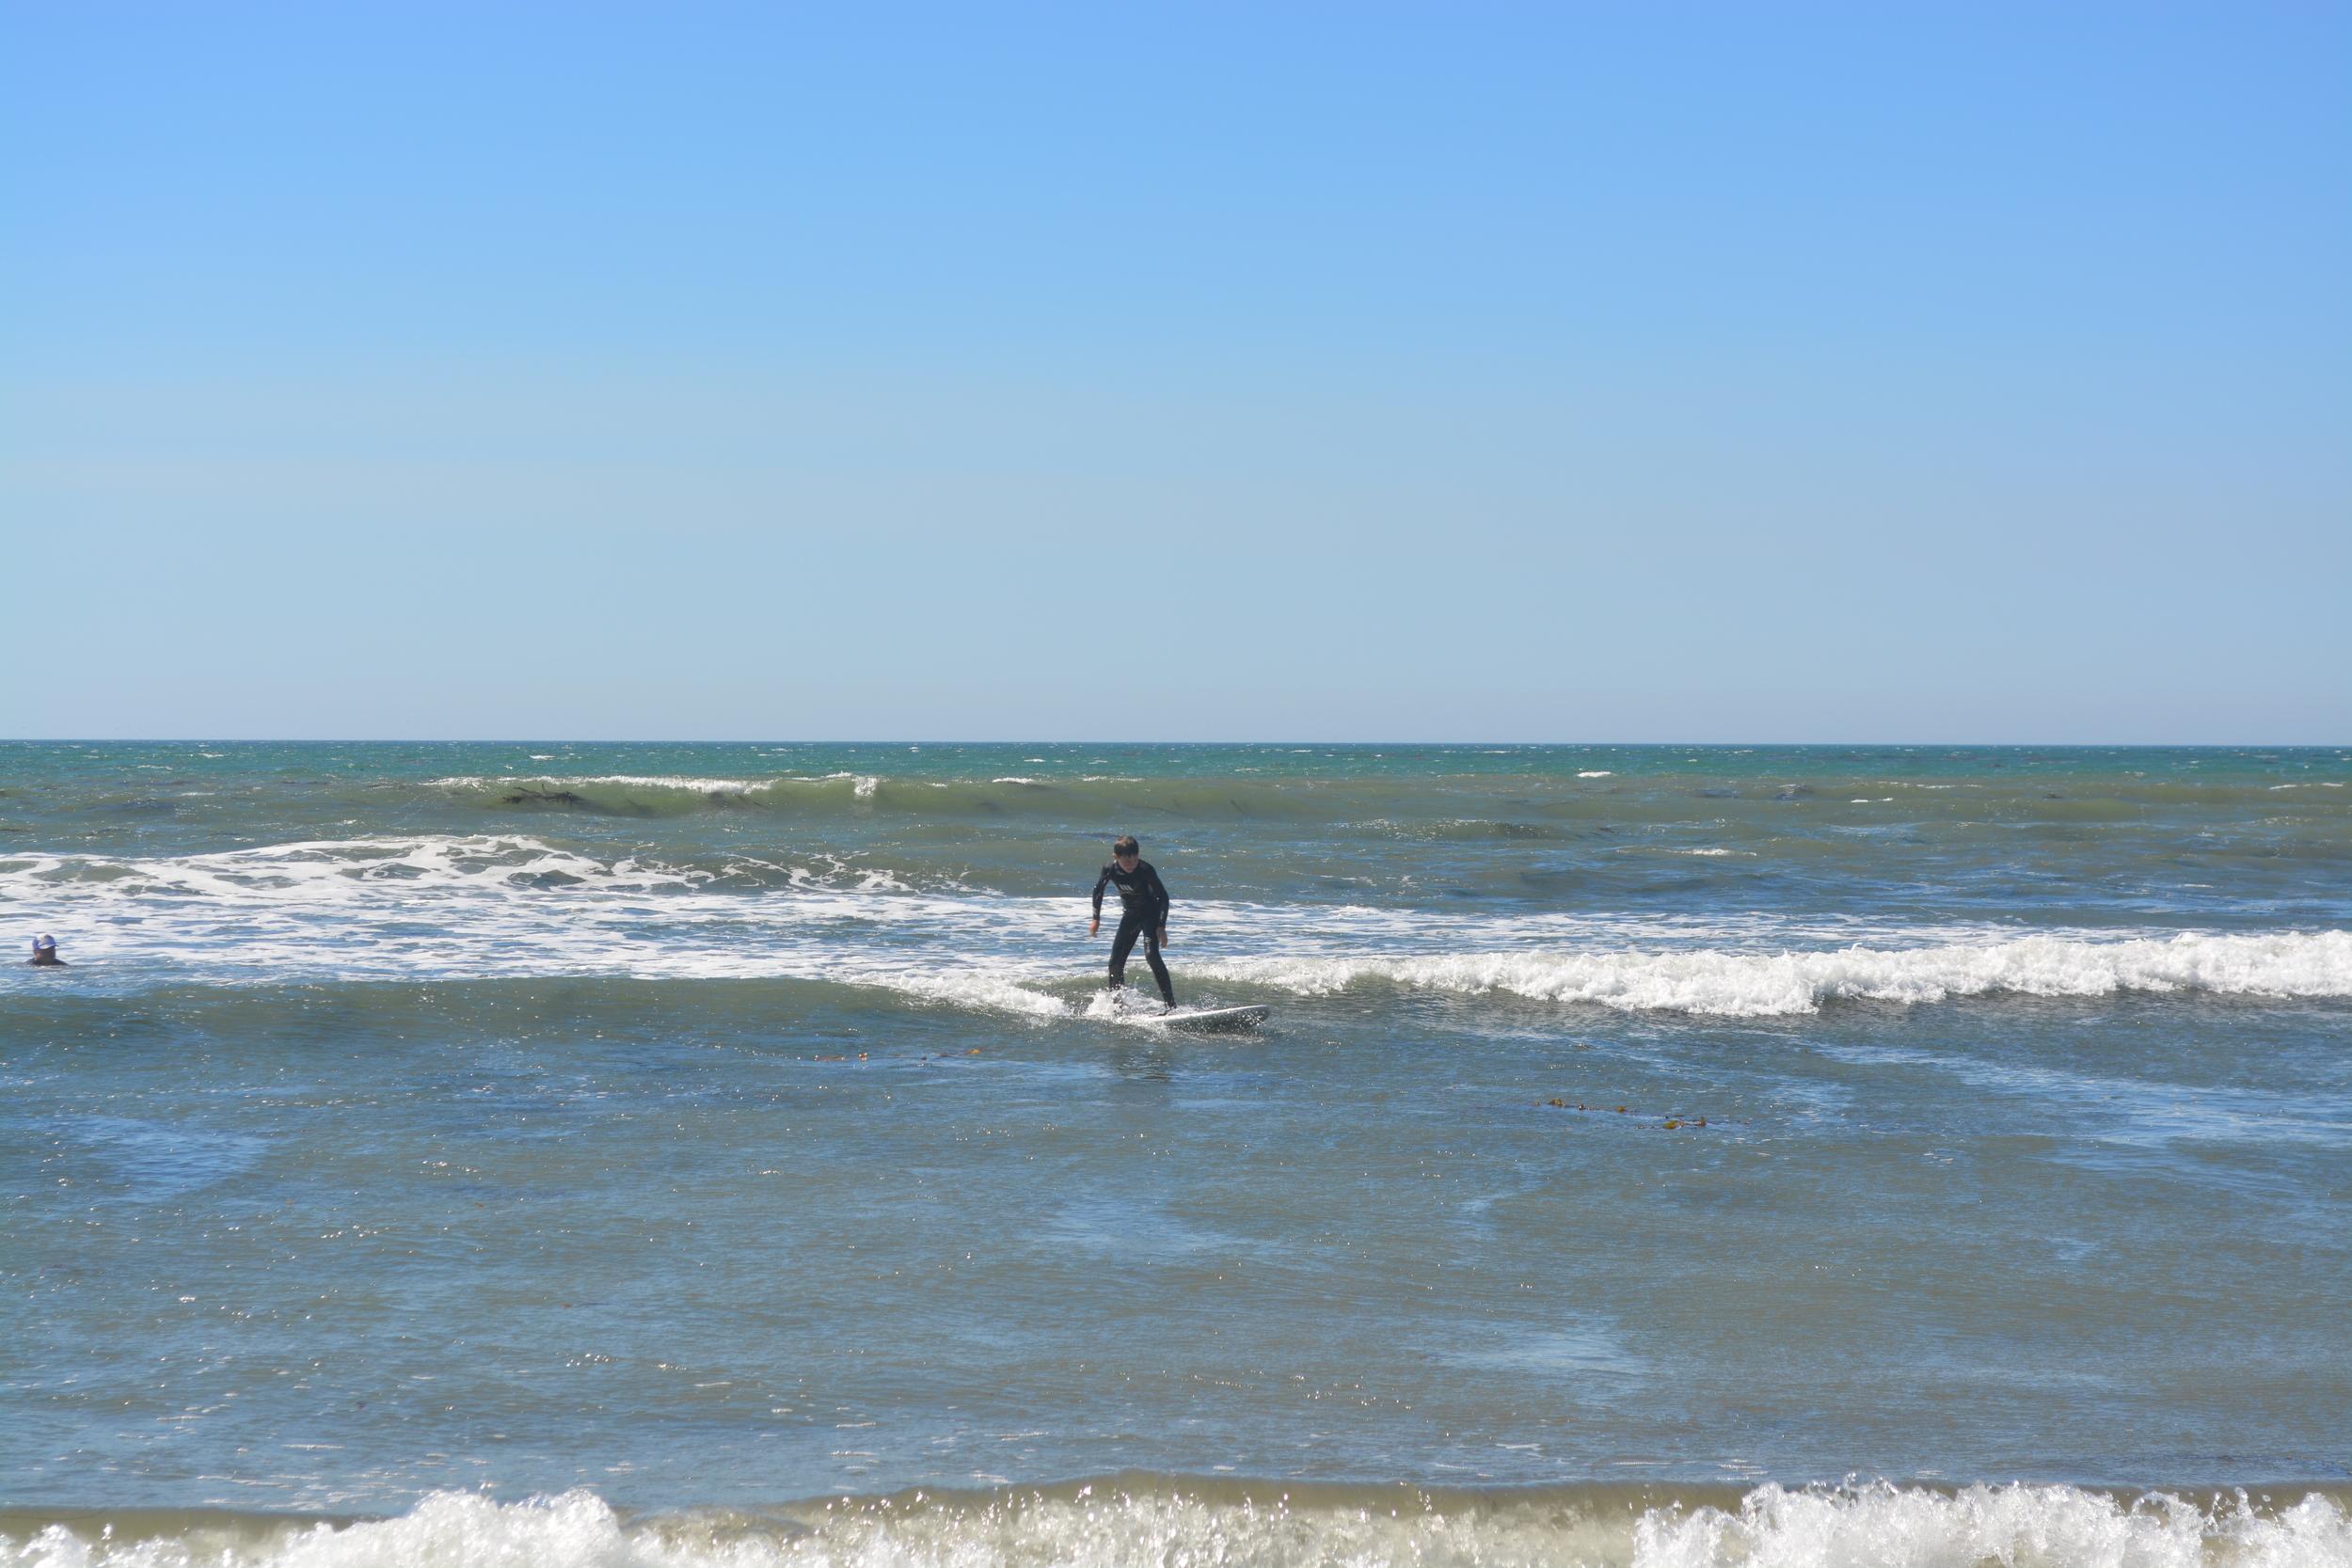 Baja California 10-5-13 Shipwrecks Surfing Adventure Ocean Experience Surf School San Diego (10).JPG